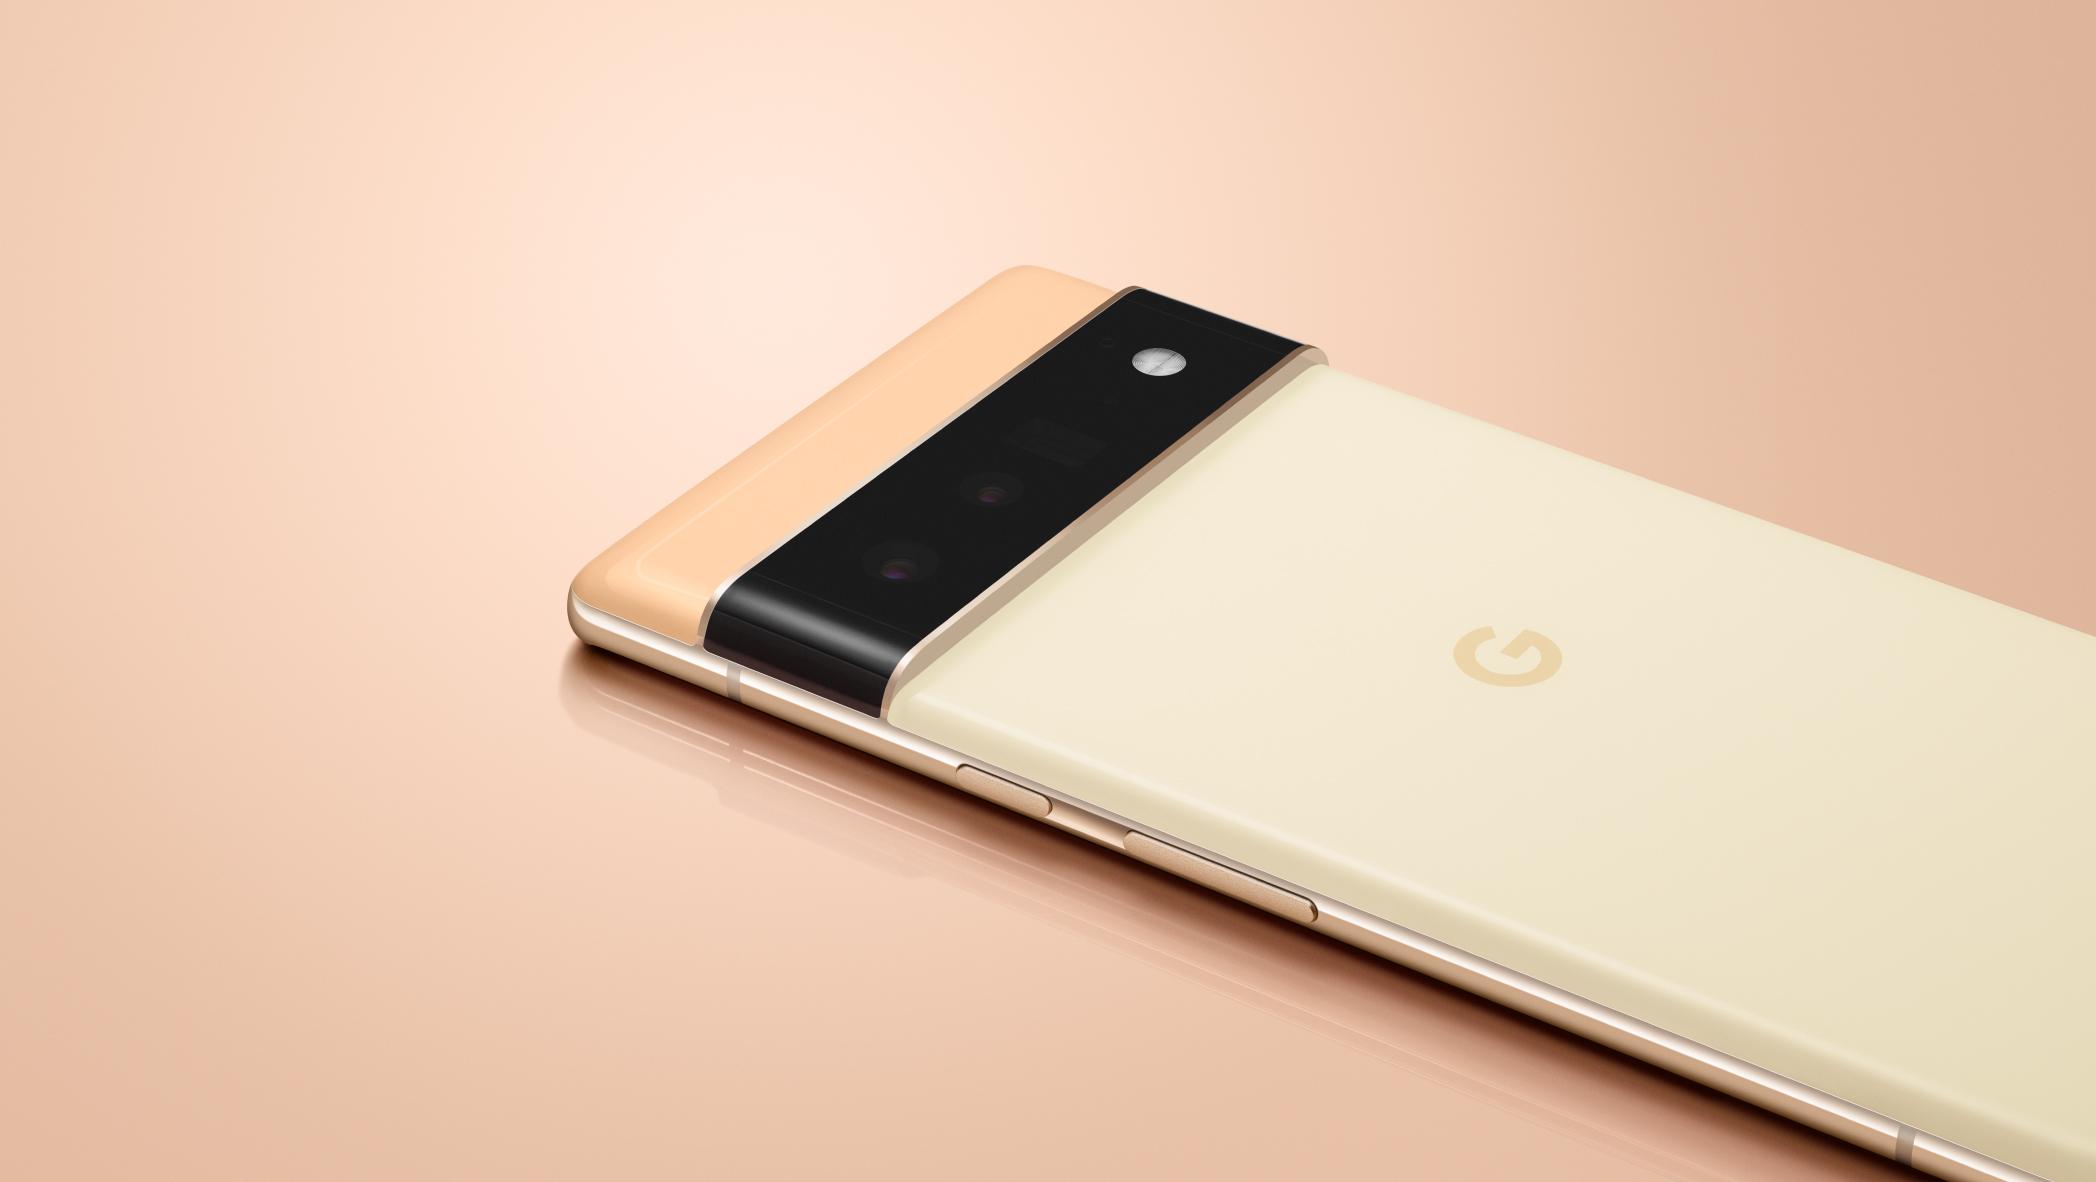 The Google Pixel 6 Pro